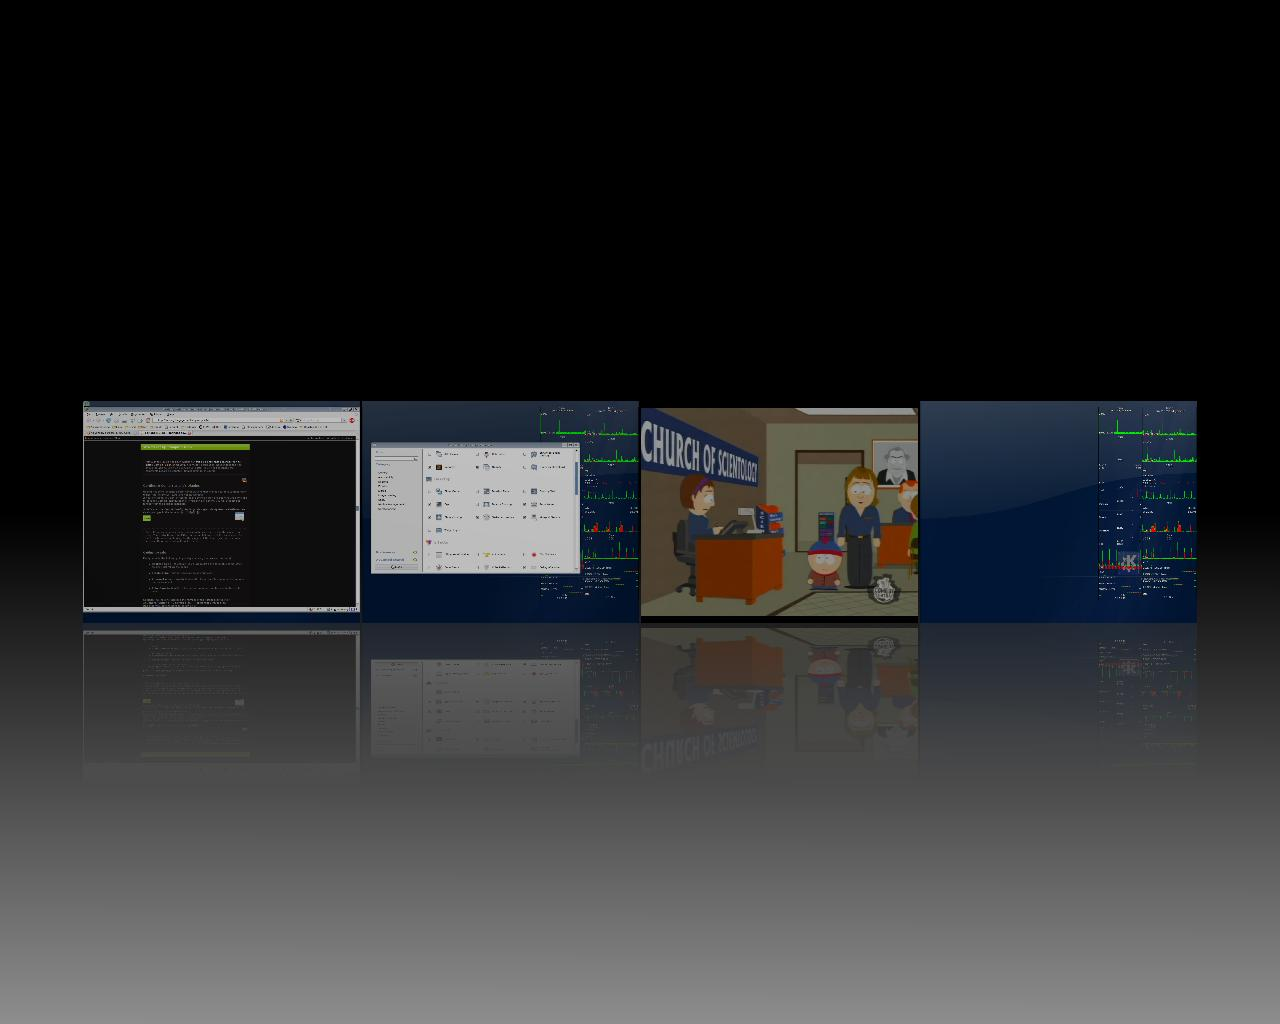 Ubuntu Gutsy – compiz with ATI X1950XT | tjansson dk